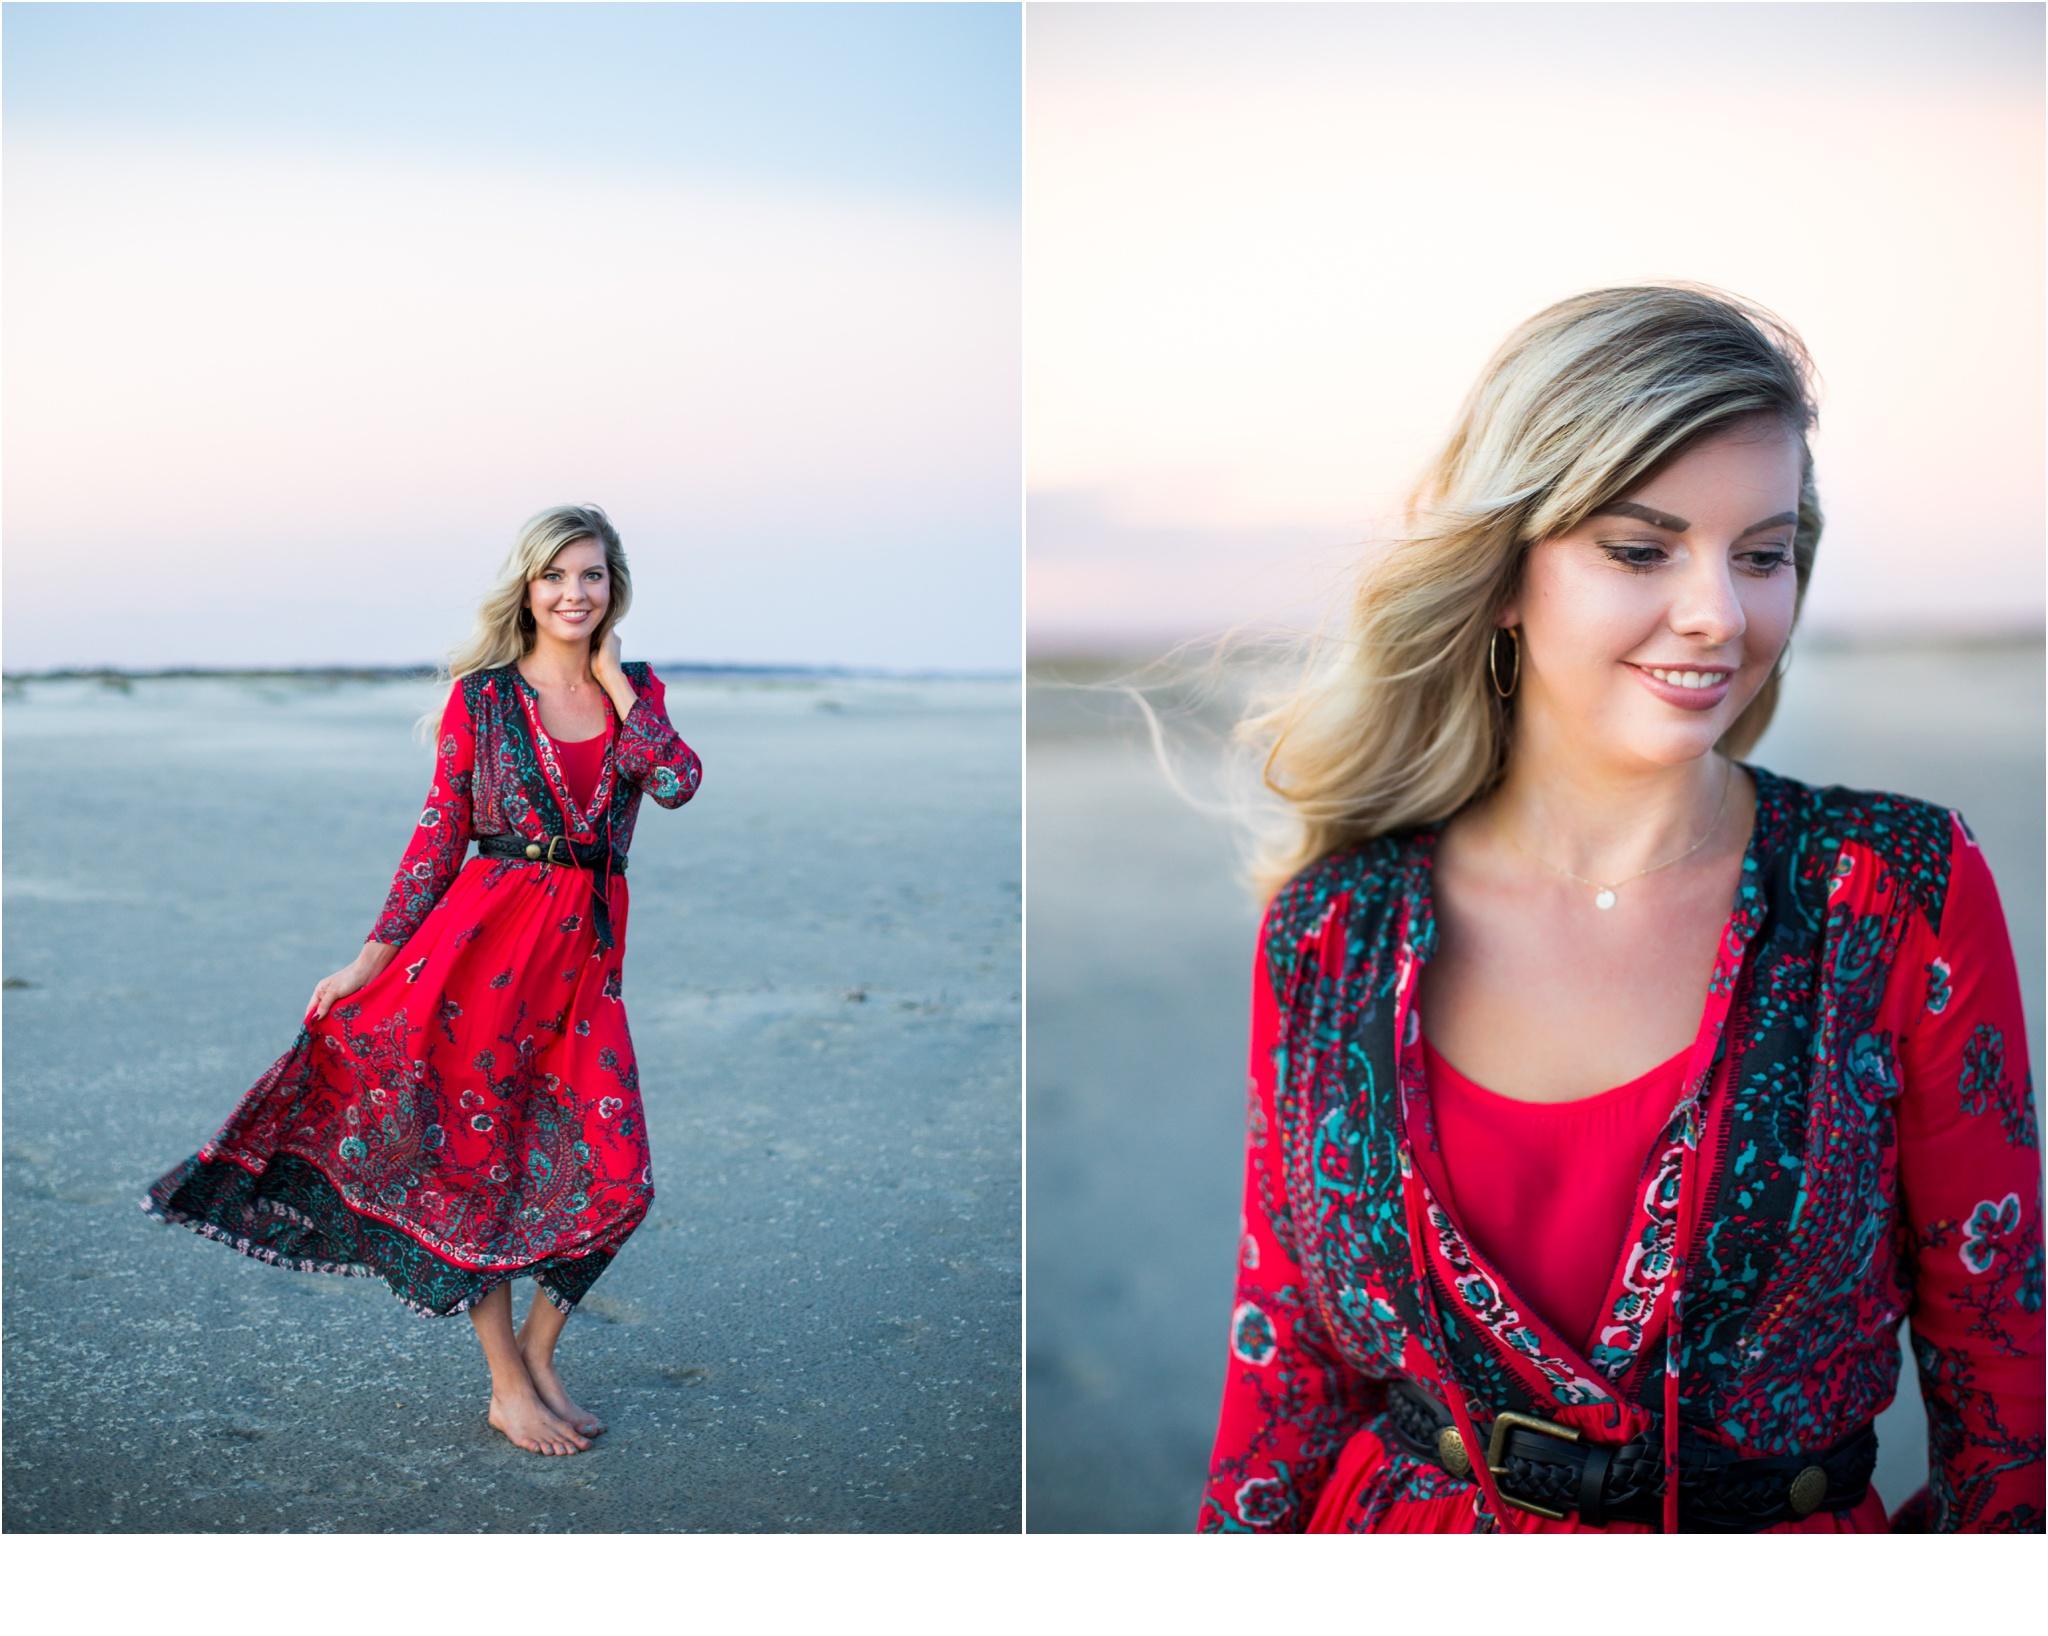 Rainey_Gregg_Photography_St._Simons_Island_Georgia_California_Wedding_Portrait_Photography_0272.jpg